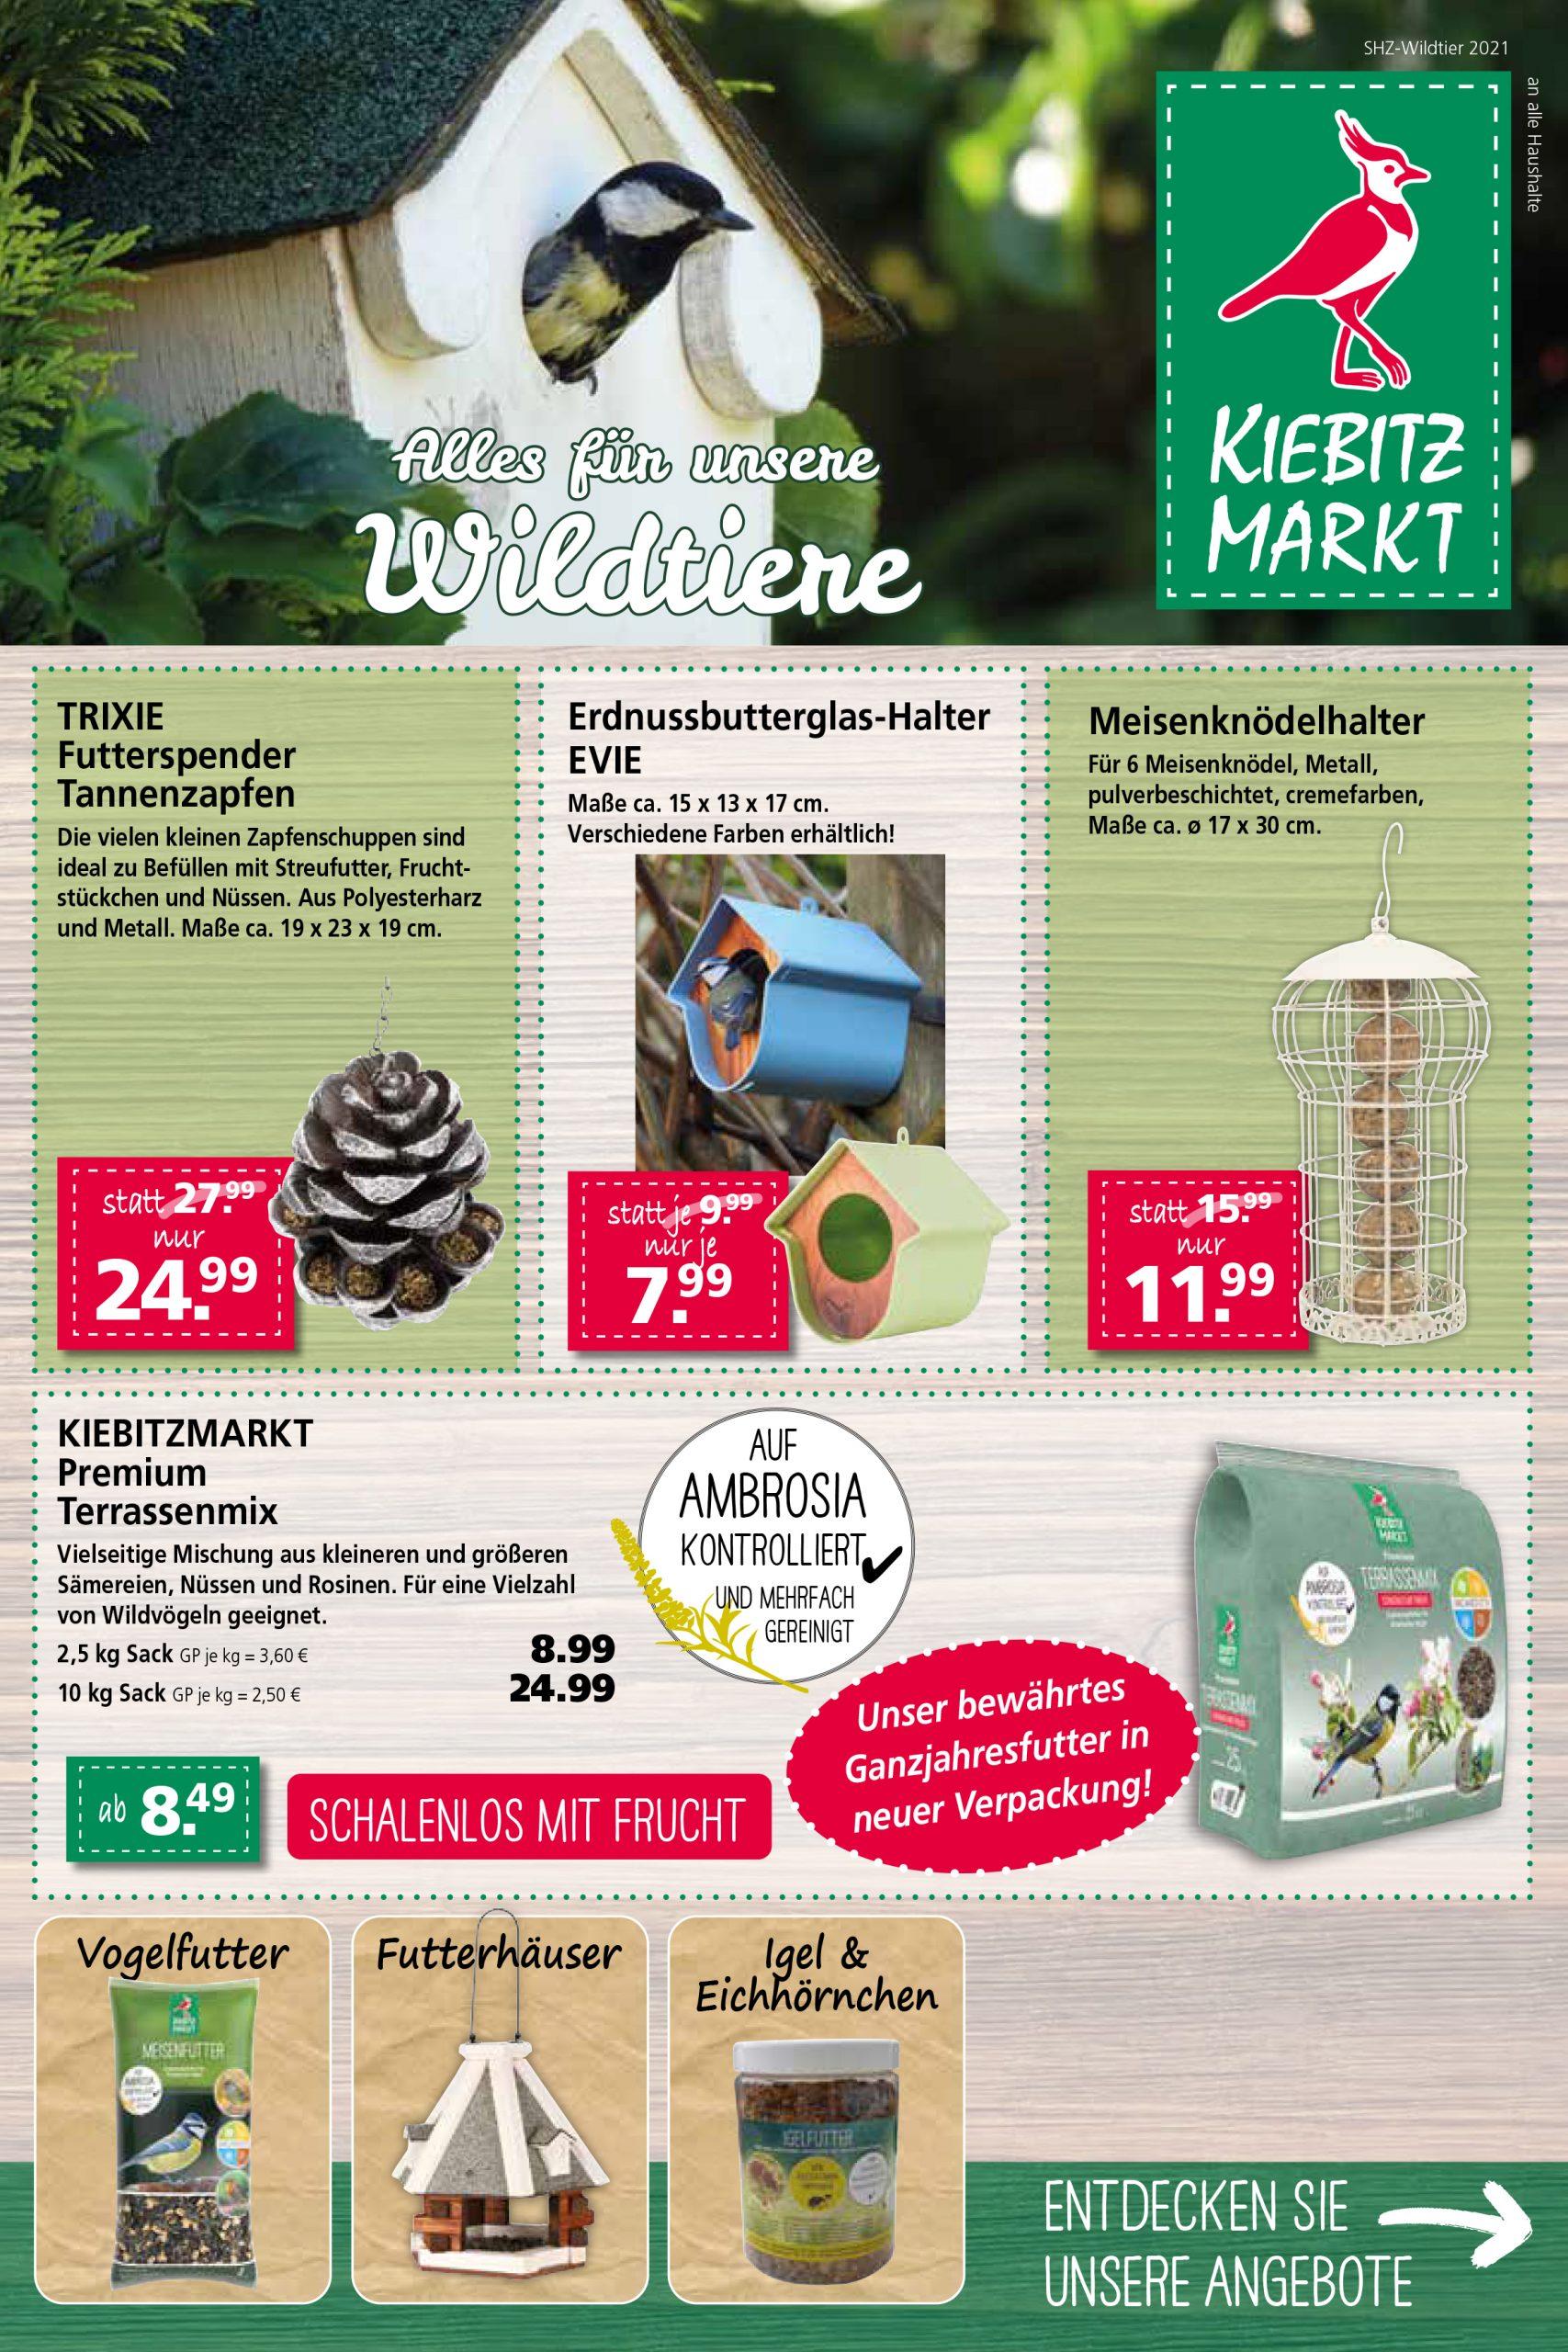 Kiebitzmarkt Angebote